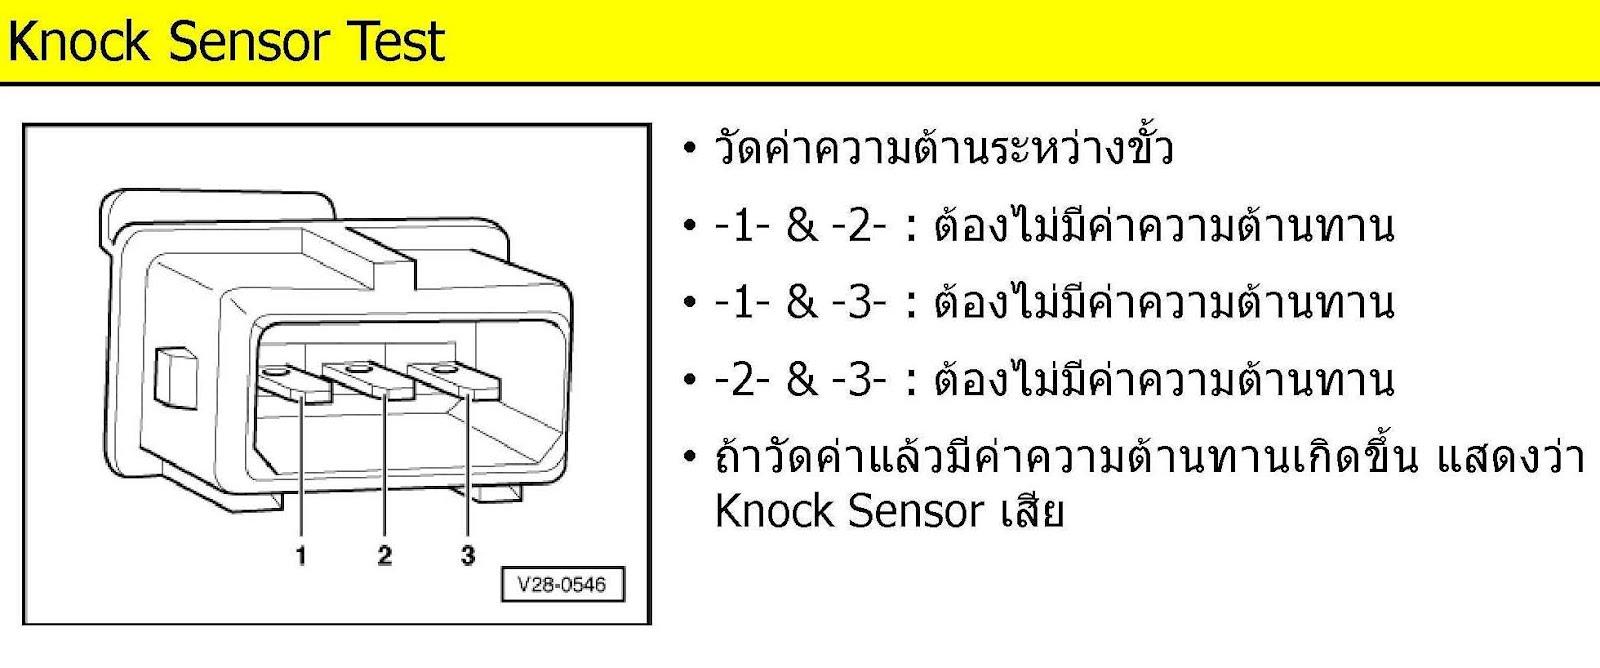 405SRI by ThawaT: Knock Sensor ( เซ็นเซอร์ตรวจจับการเขก )